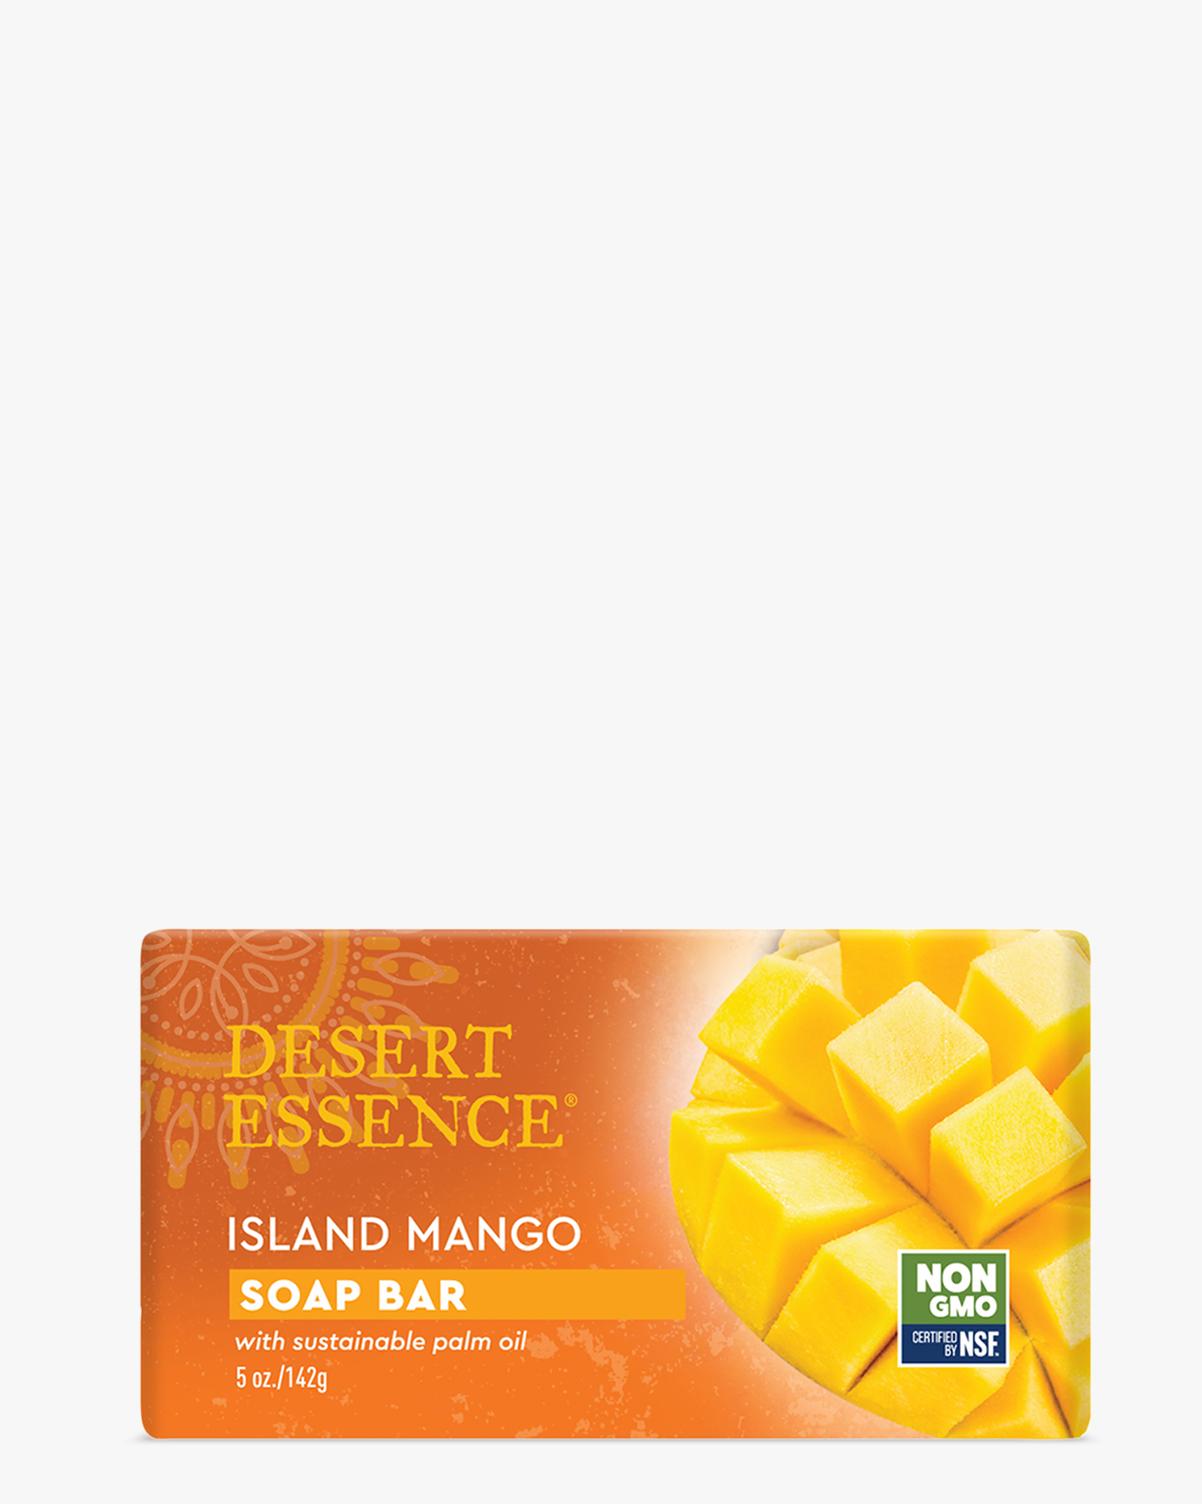 Desert Essence coupon: Desert Essence Island Mango Soap Bar, 5 oz. | Vegan | Gluten-Free